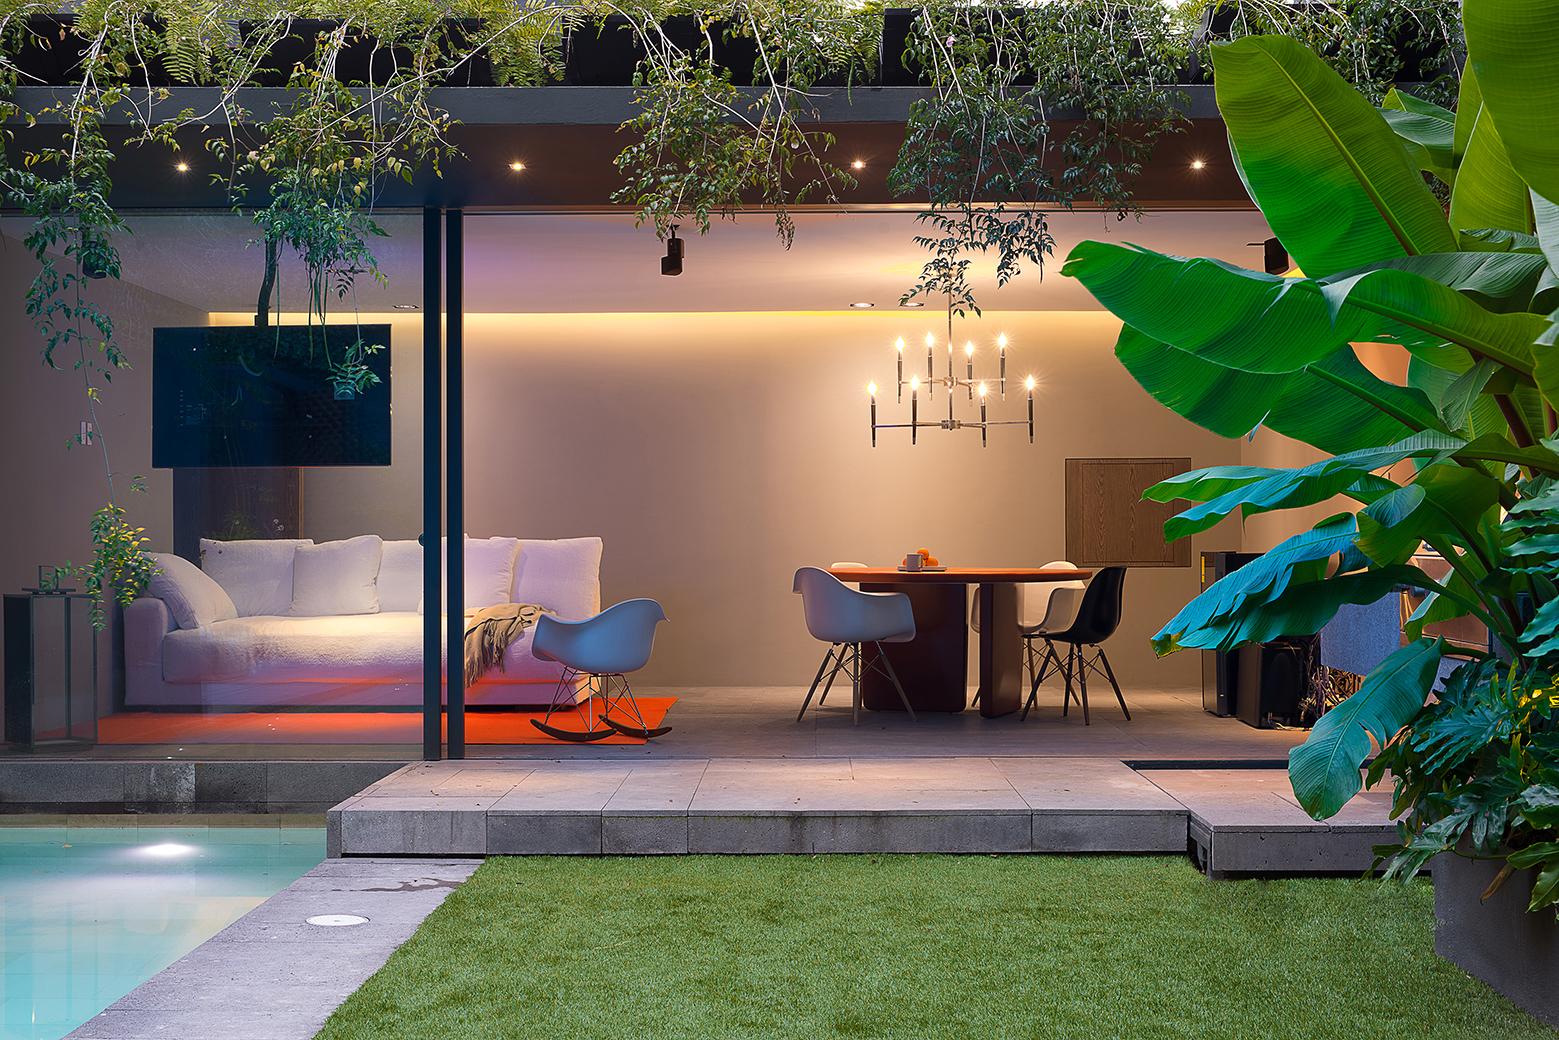 Barrancas-House- nowoczesna-willa-rezydencja-projekty-13